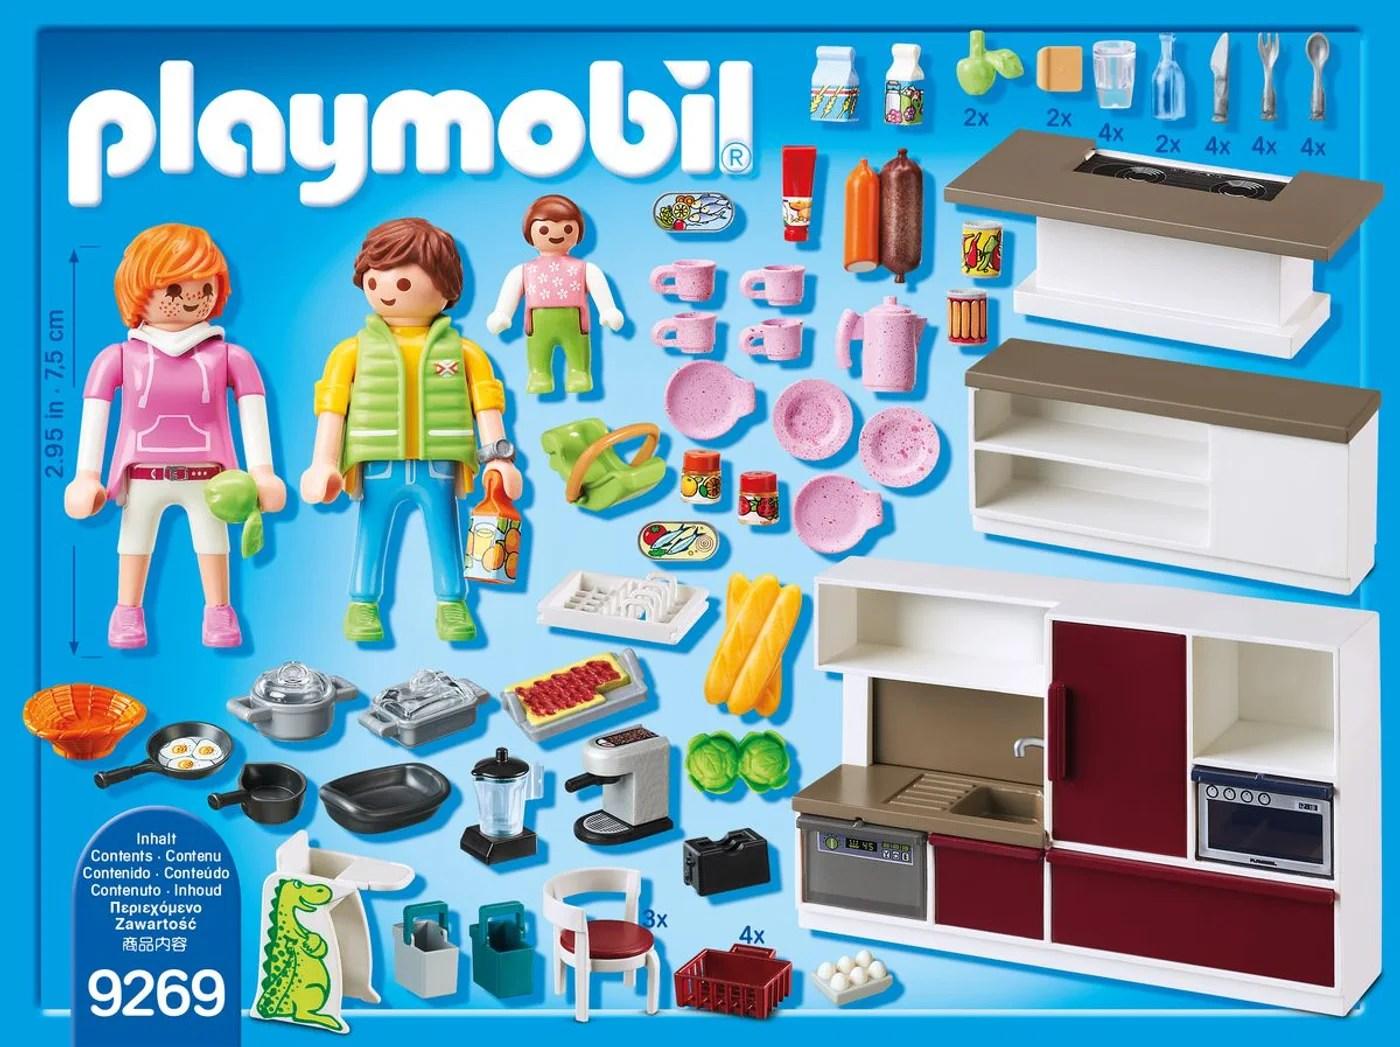 Playmobil Badezimmer 9268 | Bilder Playmobil Küche